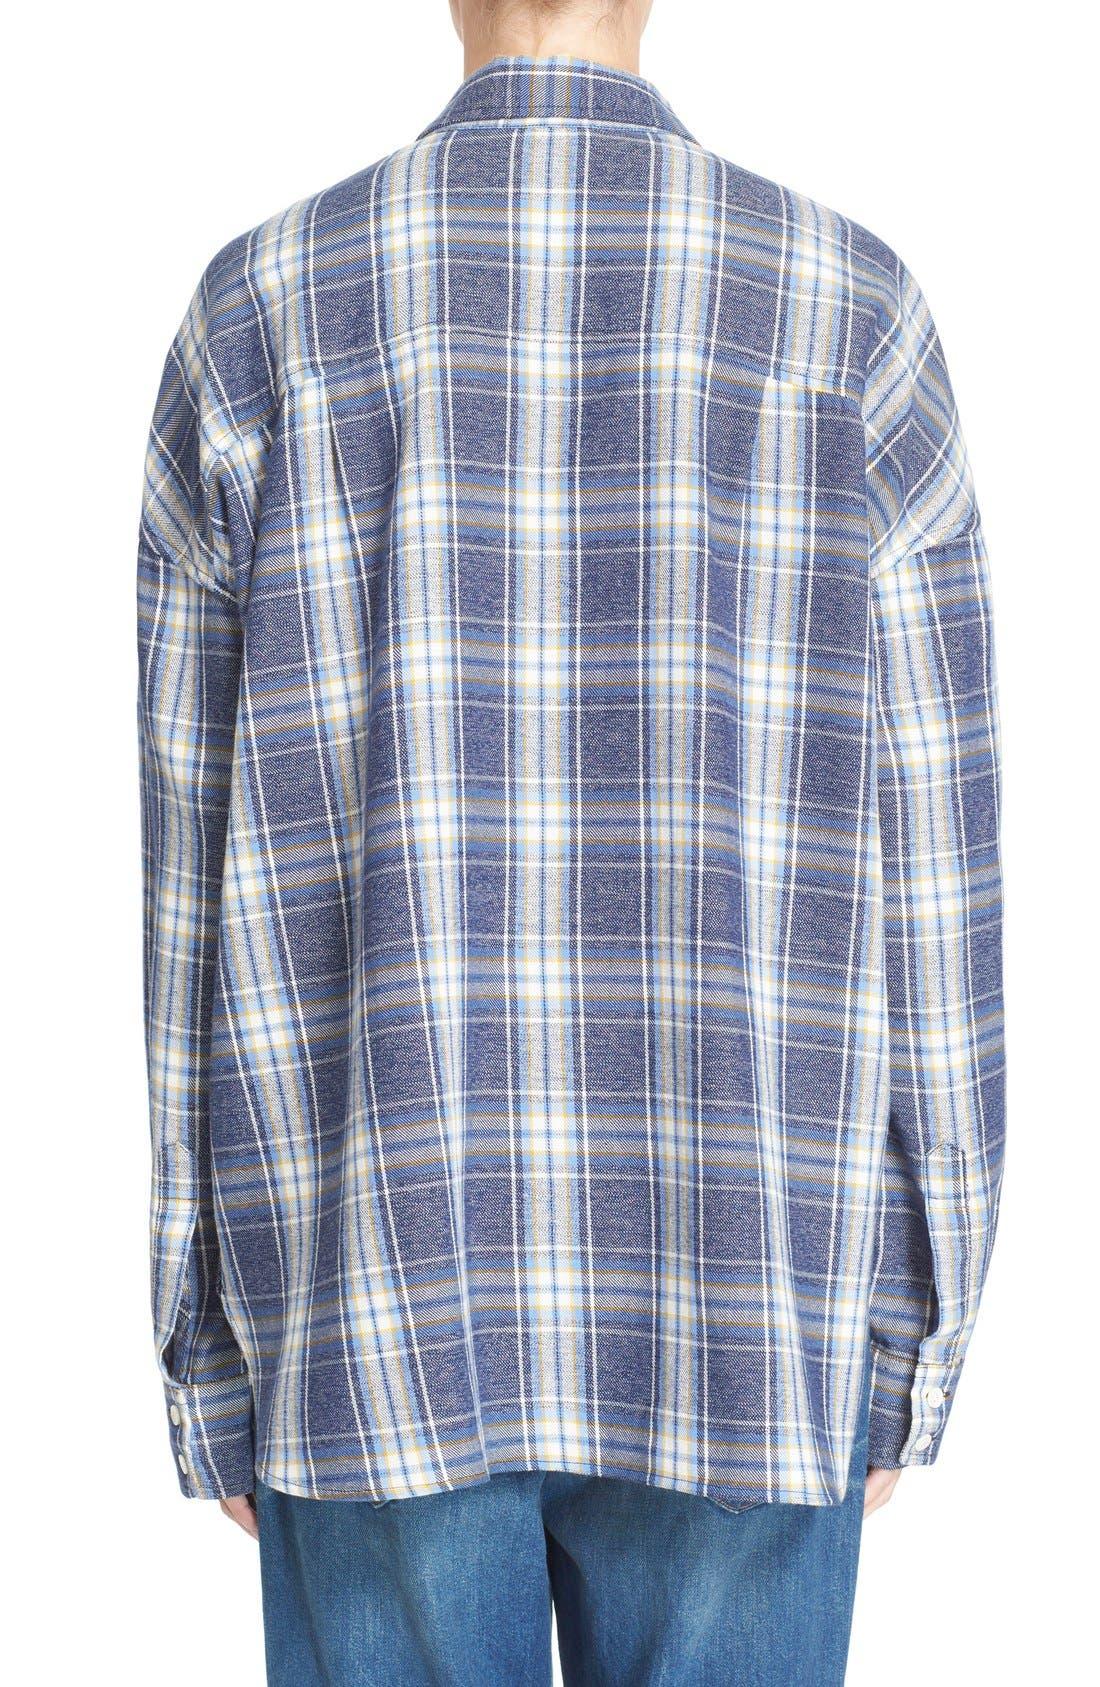 Alternate Image 2  - 6397 'Lori' Cotton Flannel Shirt